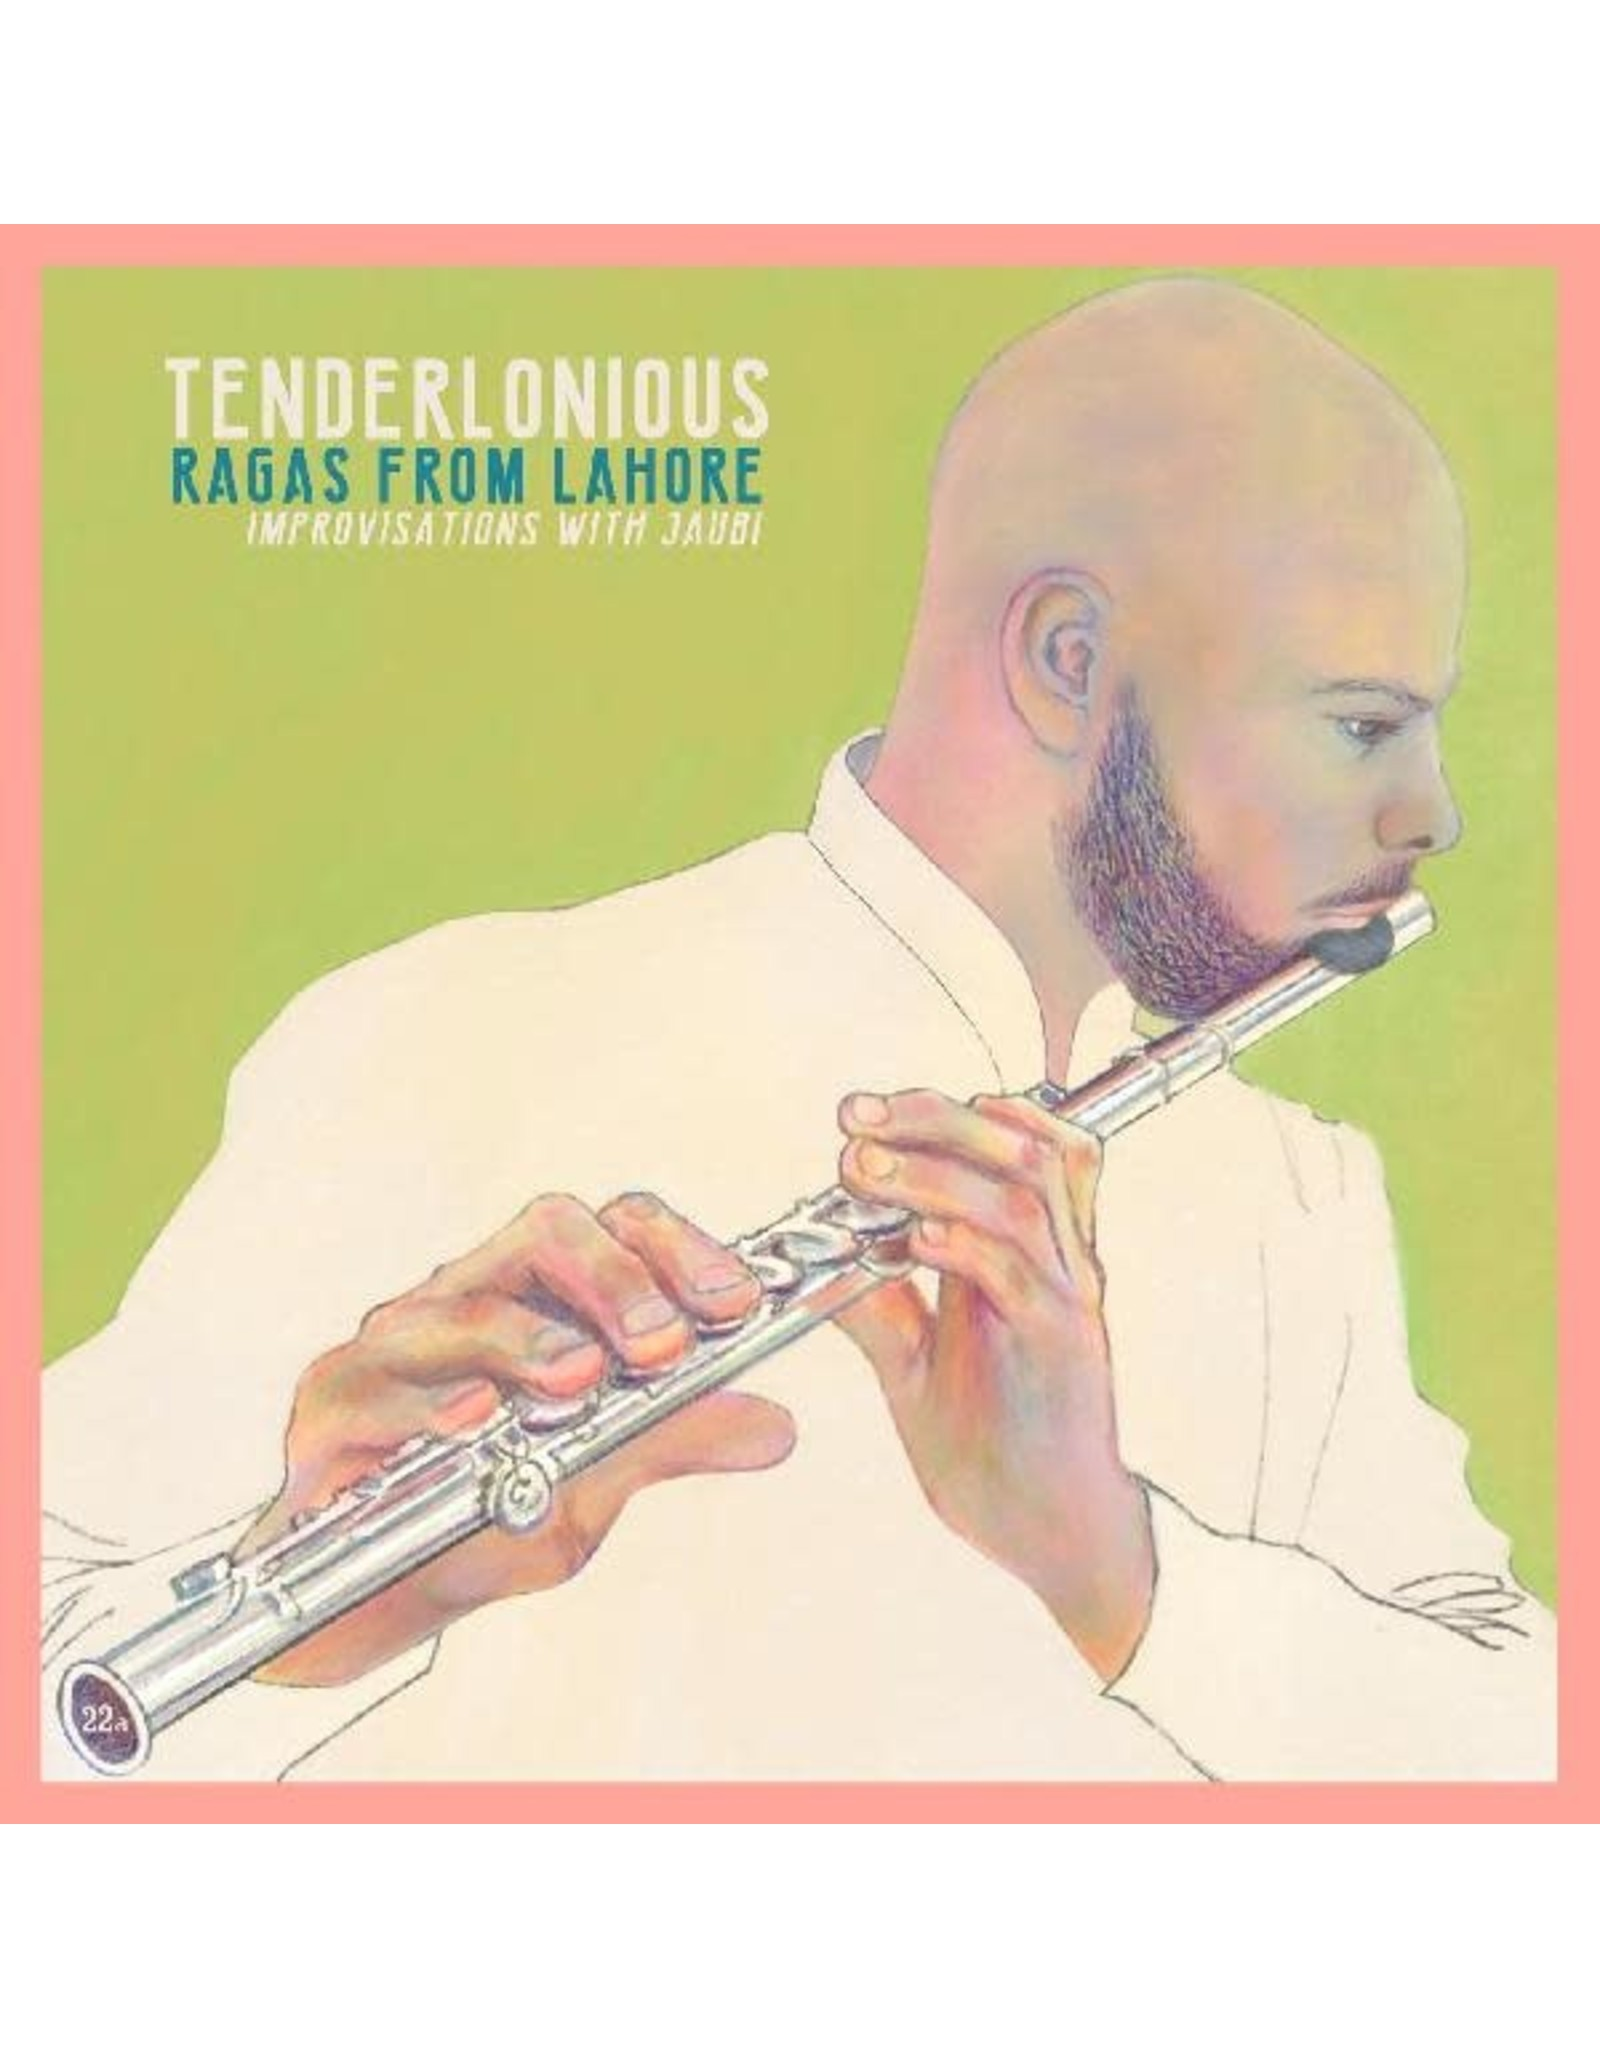 New Vinyl Tenderlonious - Ragas From Lahore: Improvisations With Jaubi LP